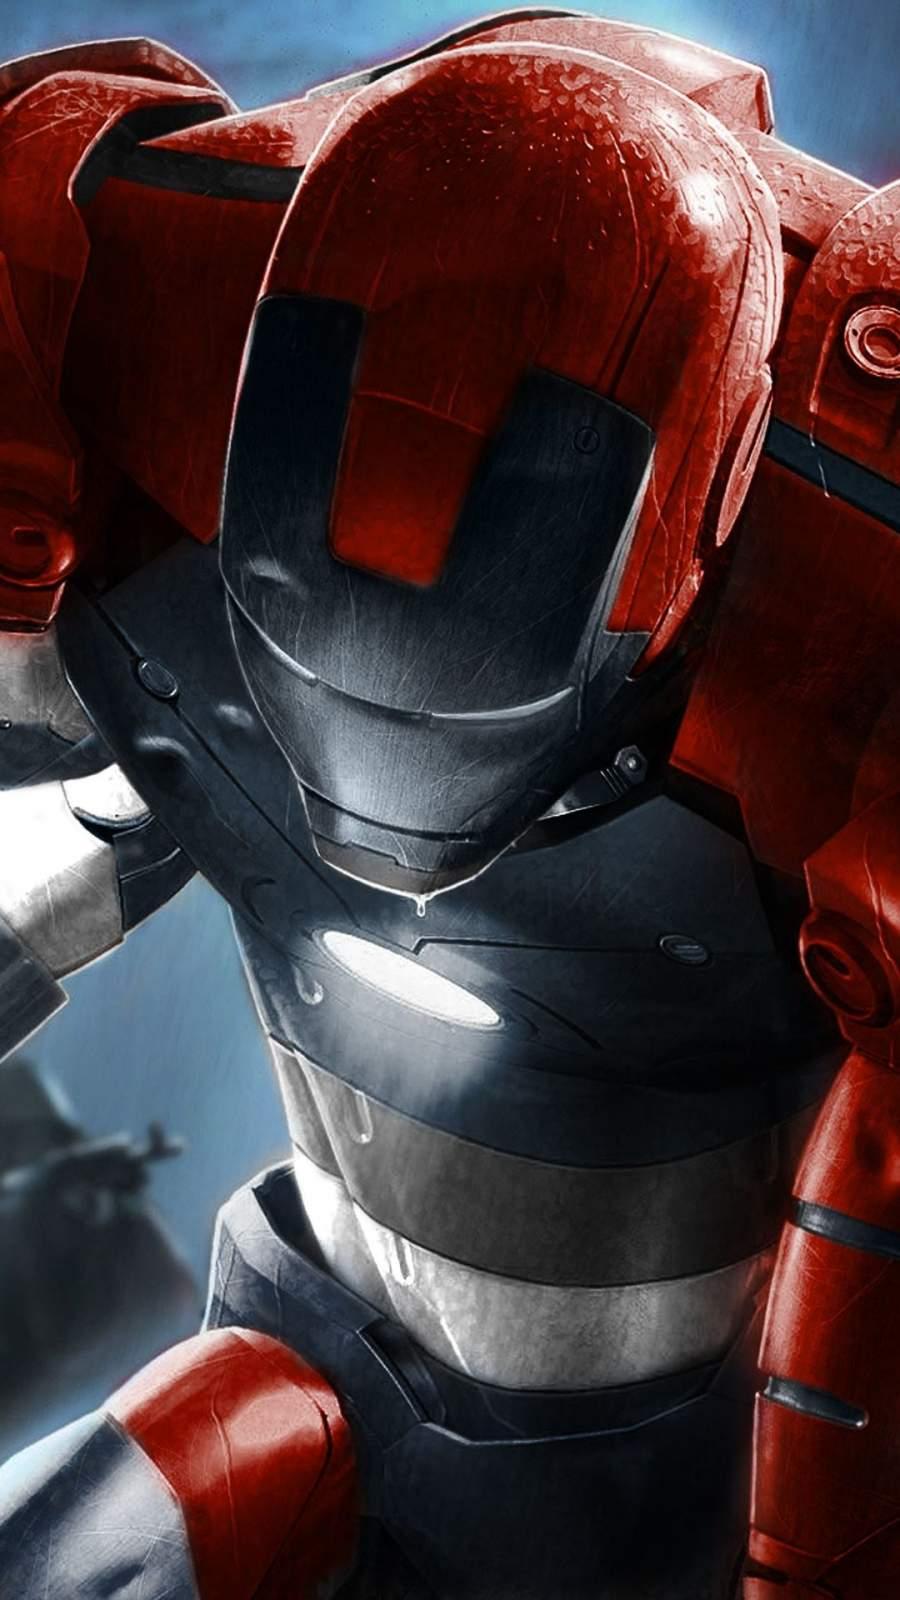 Iron Man Comic Art iPhone Wallpaper